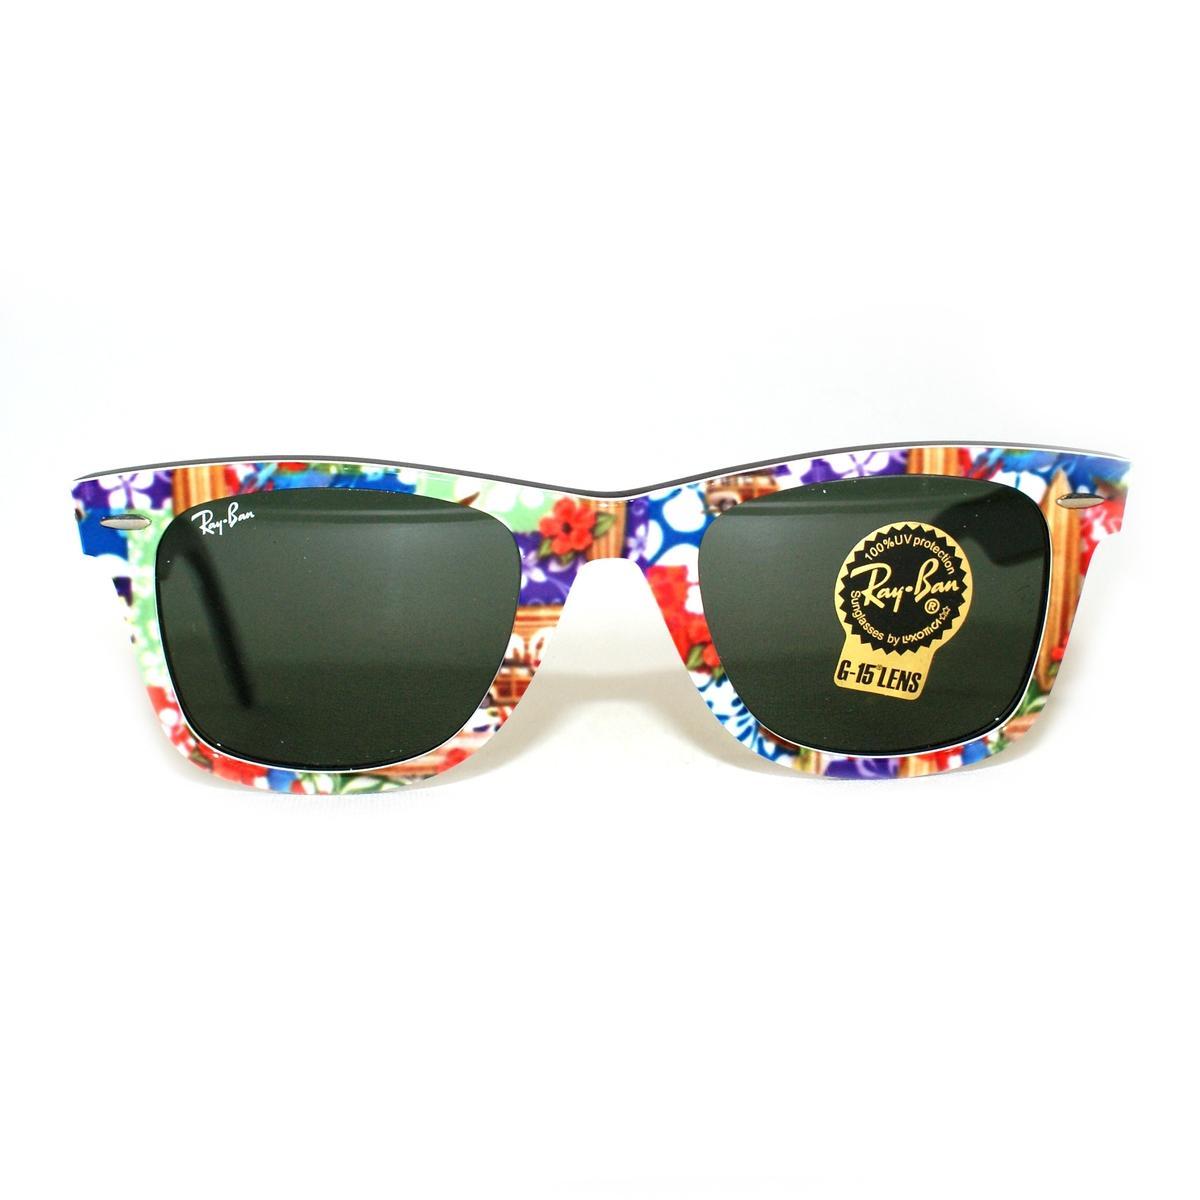 Ray Ban Ray Ban Original Wayfarer Sunglasses Special